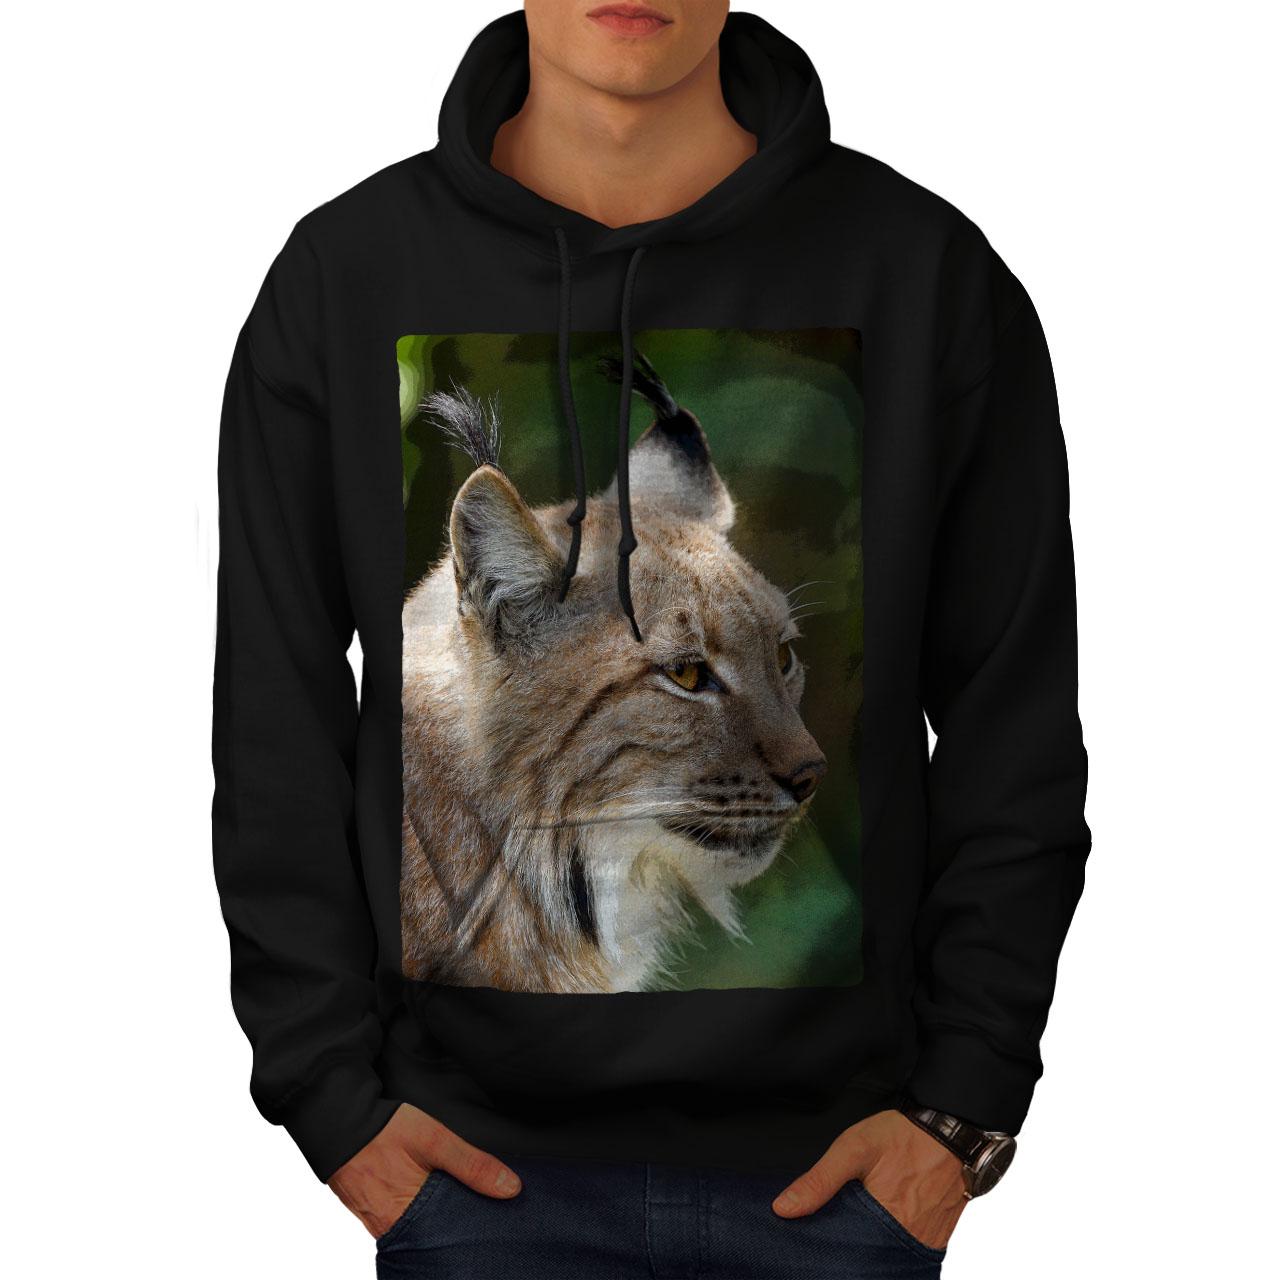 wellcoda Golden Bridge UK Mens Sweatshirt Furry Casual Jumper